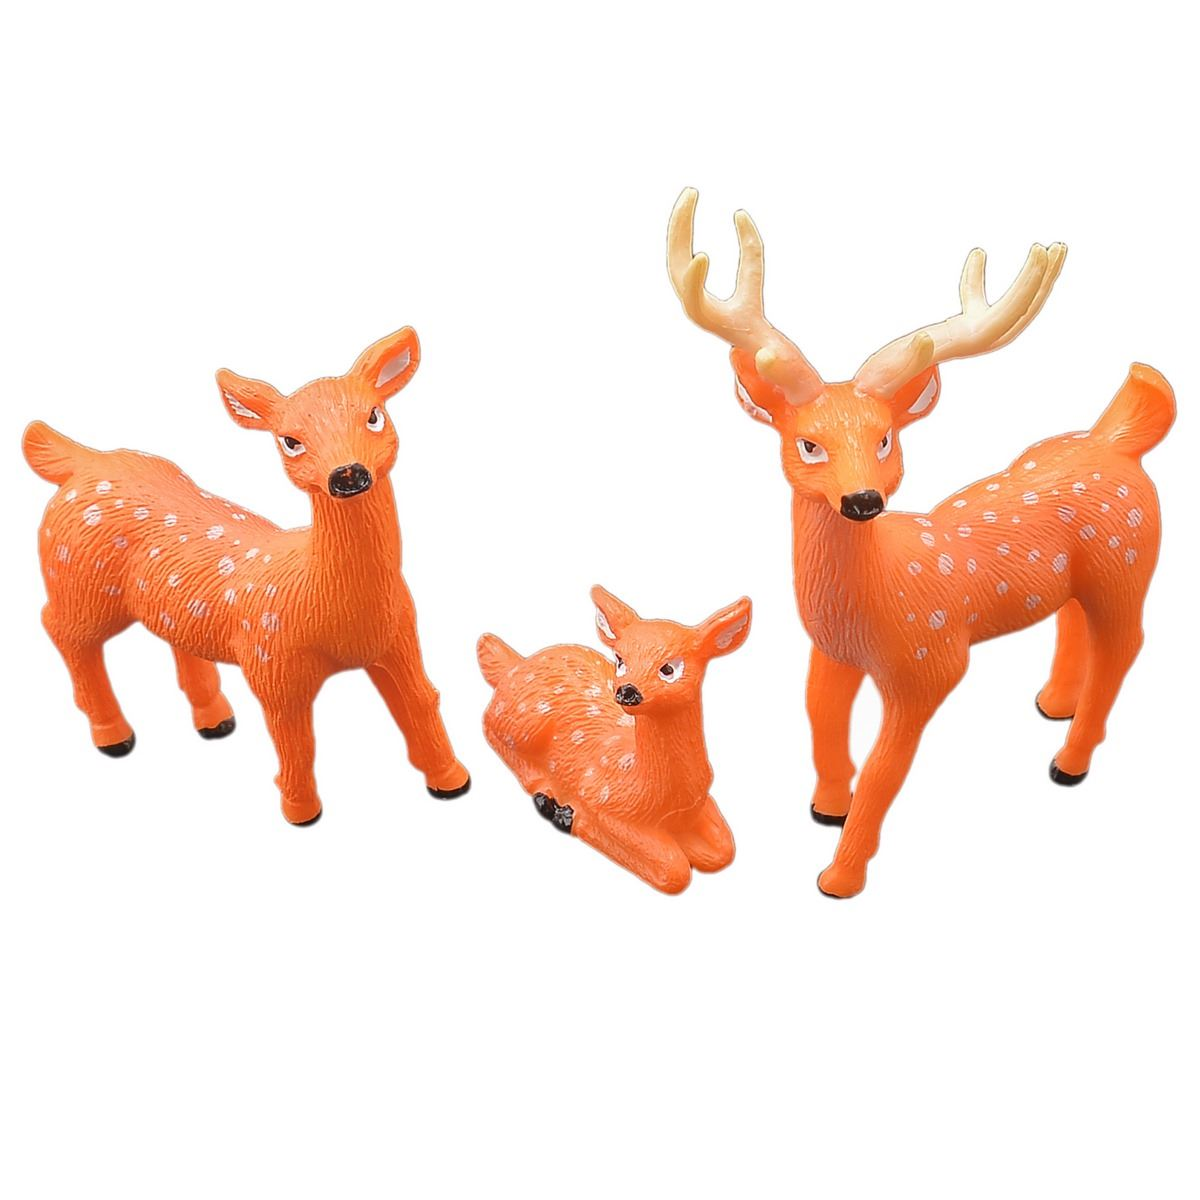 Miniature Deer Orange